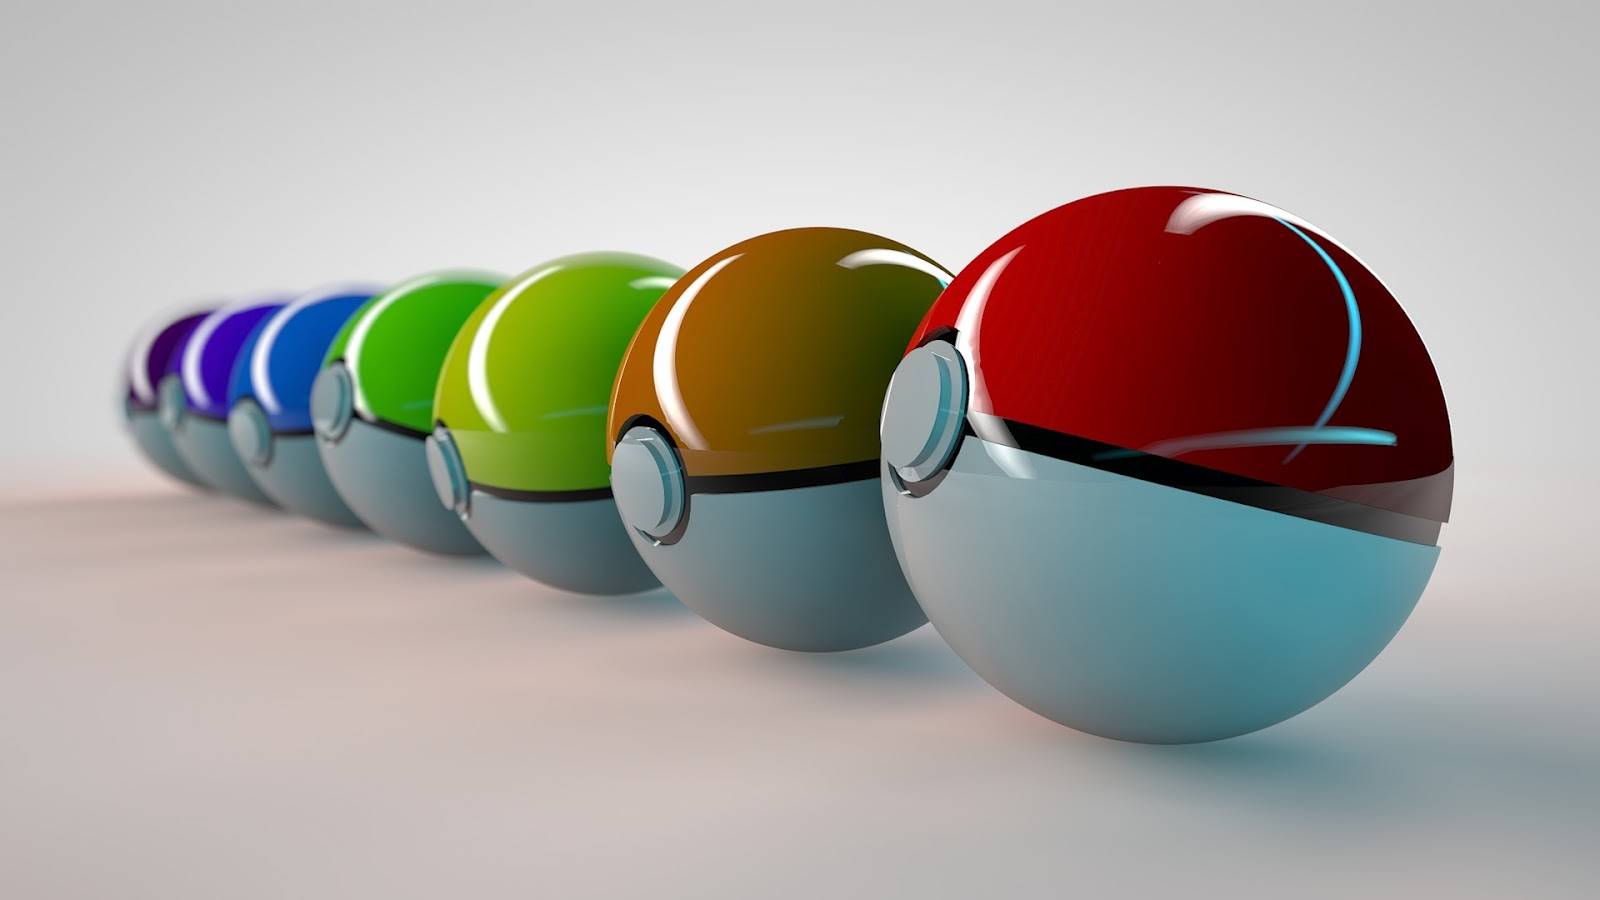 3d balls abstract